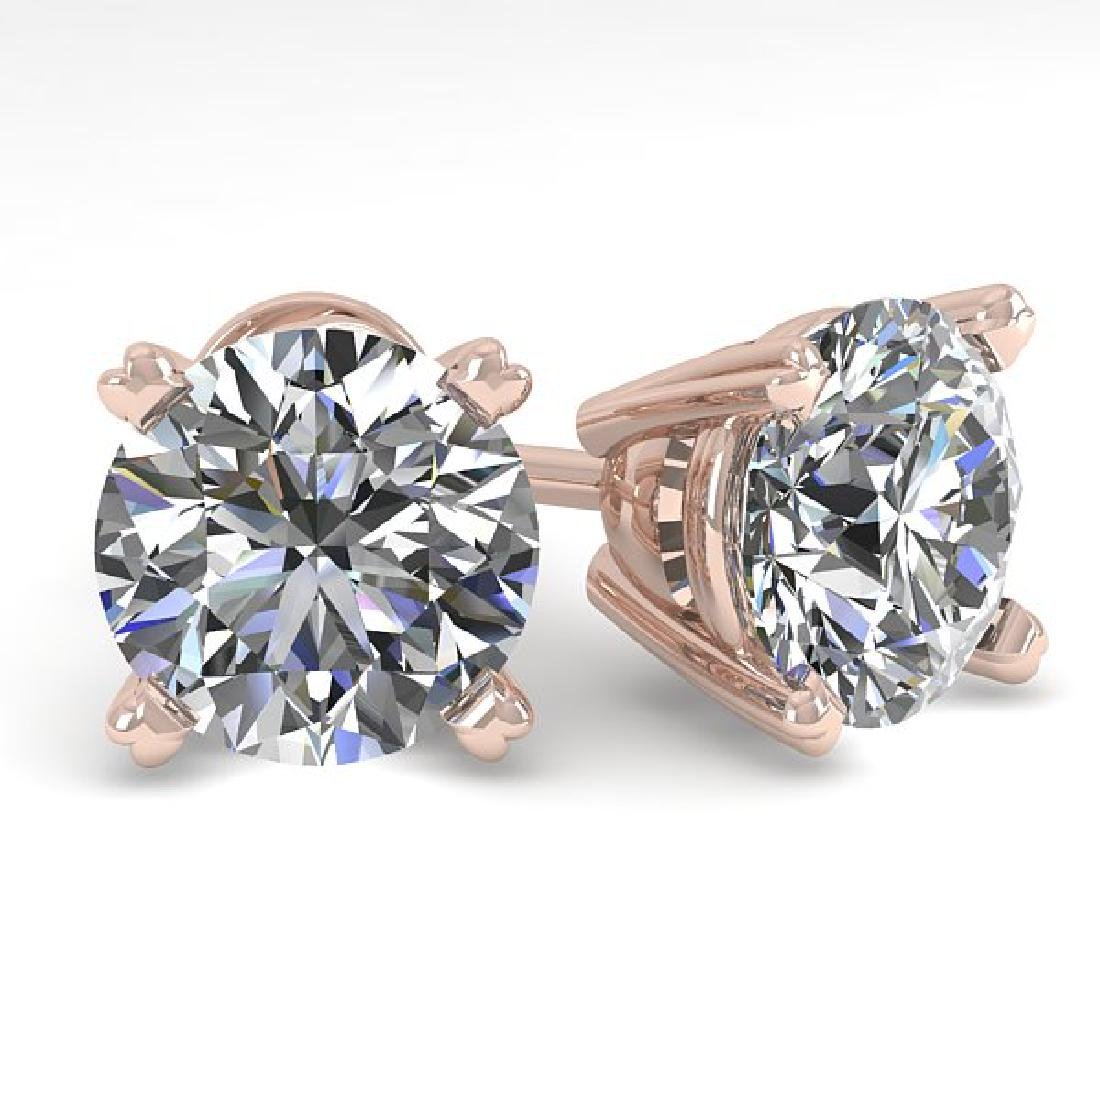 2.53 CTW Certified VS/SI Diamond Stud Earrings 14K Rose